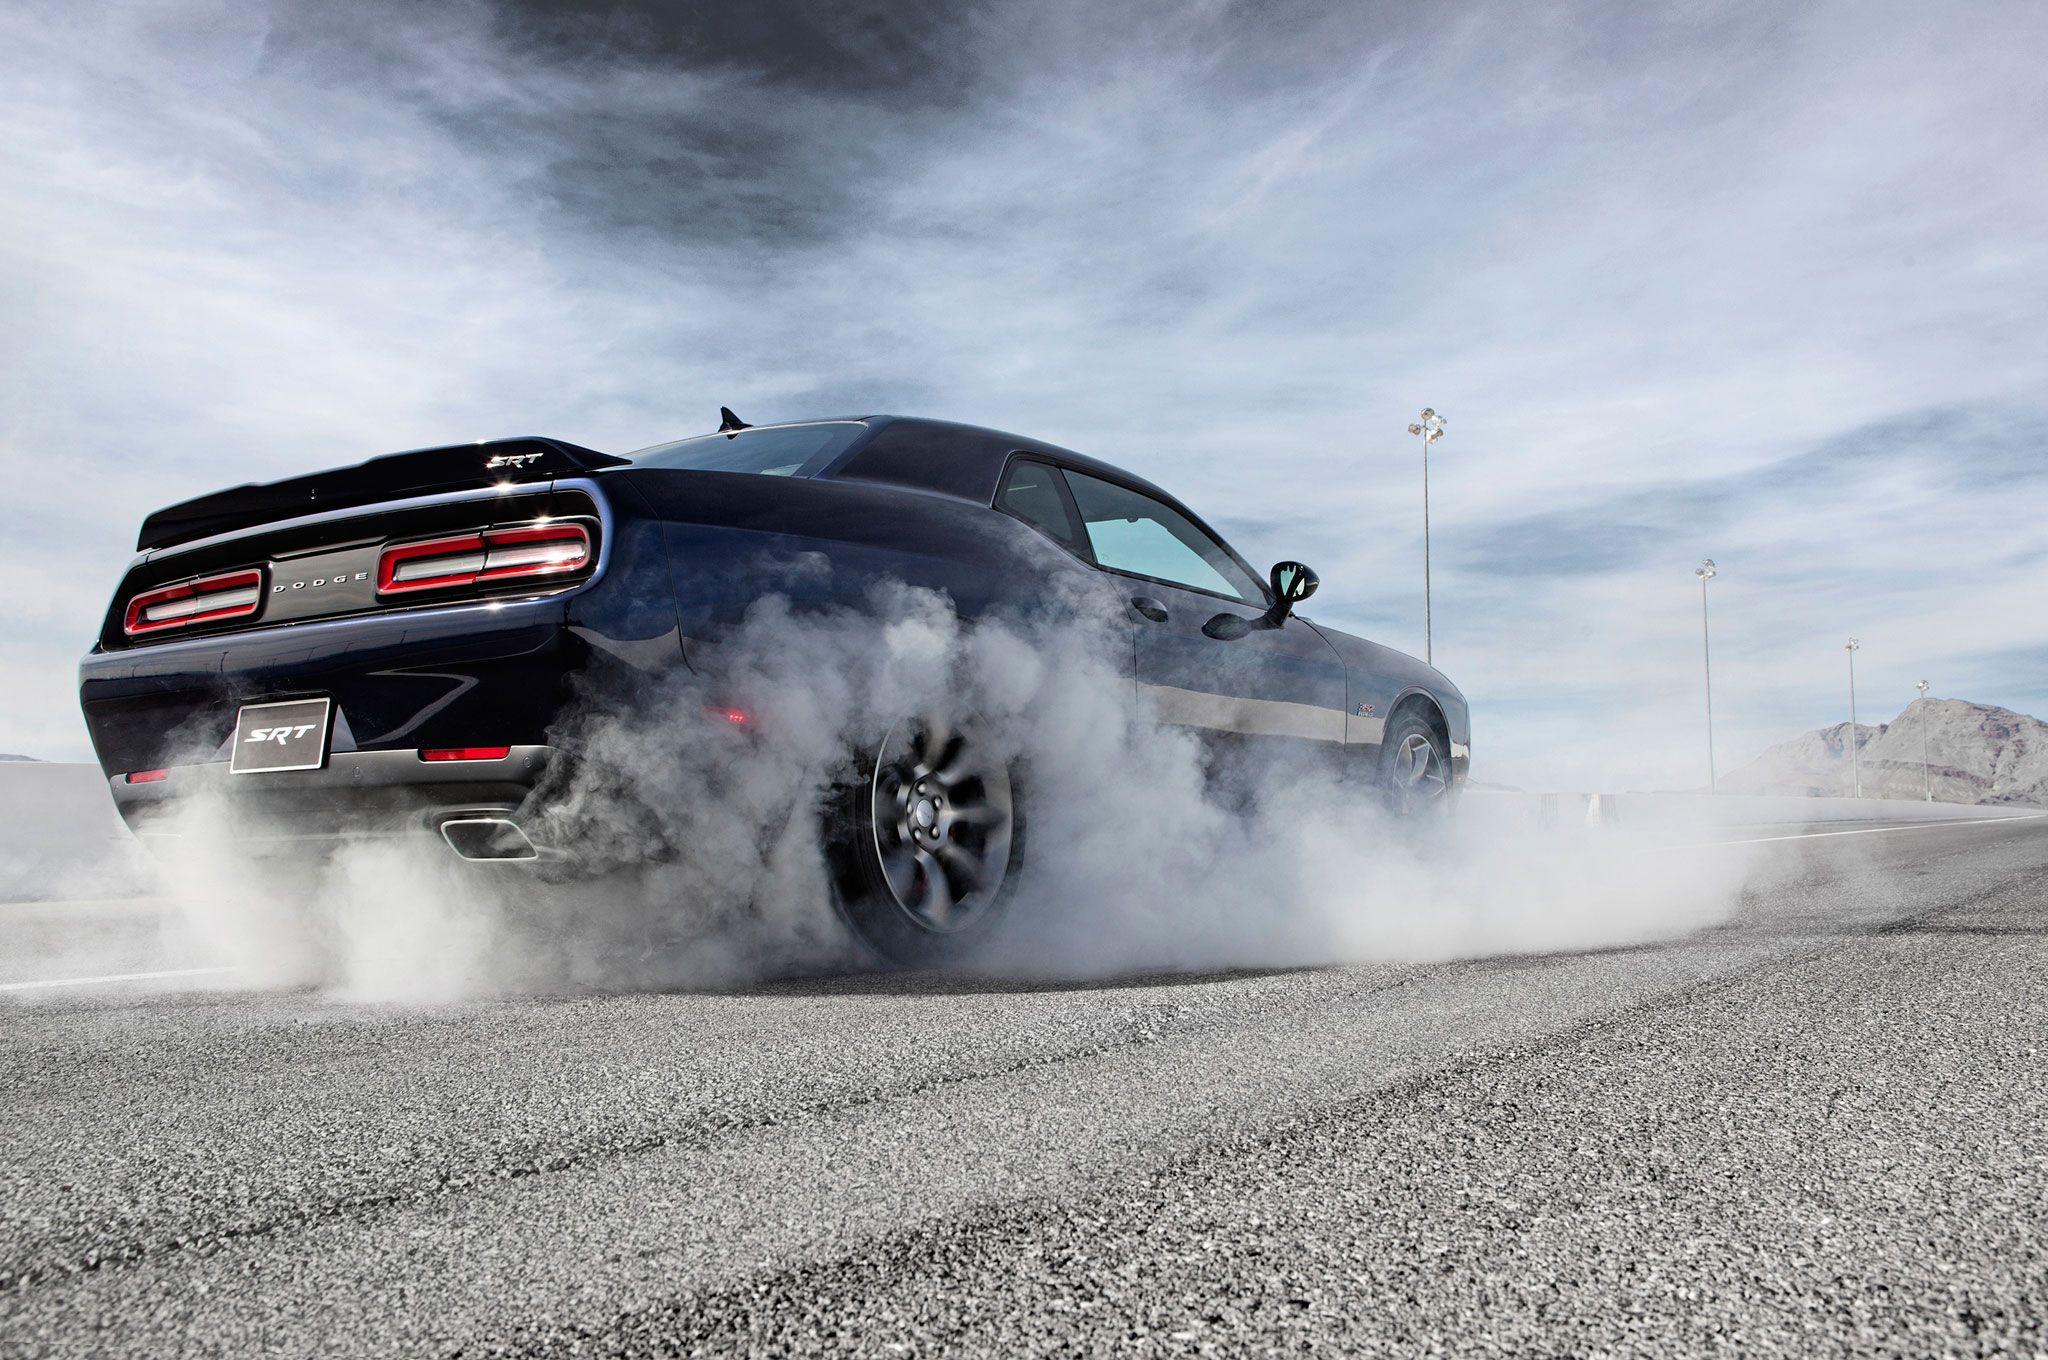 2015 dodge challenger srt hemi hellcat burnout - 2015 Dodge Challenger Srt With The Hemi Hellcat Engine